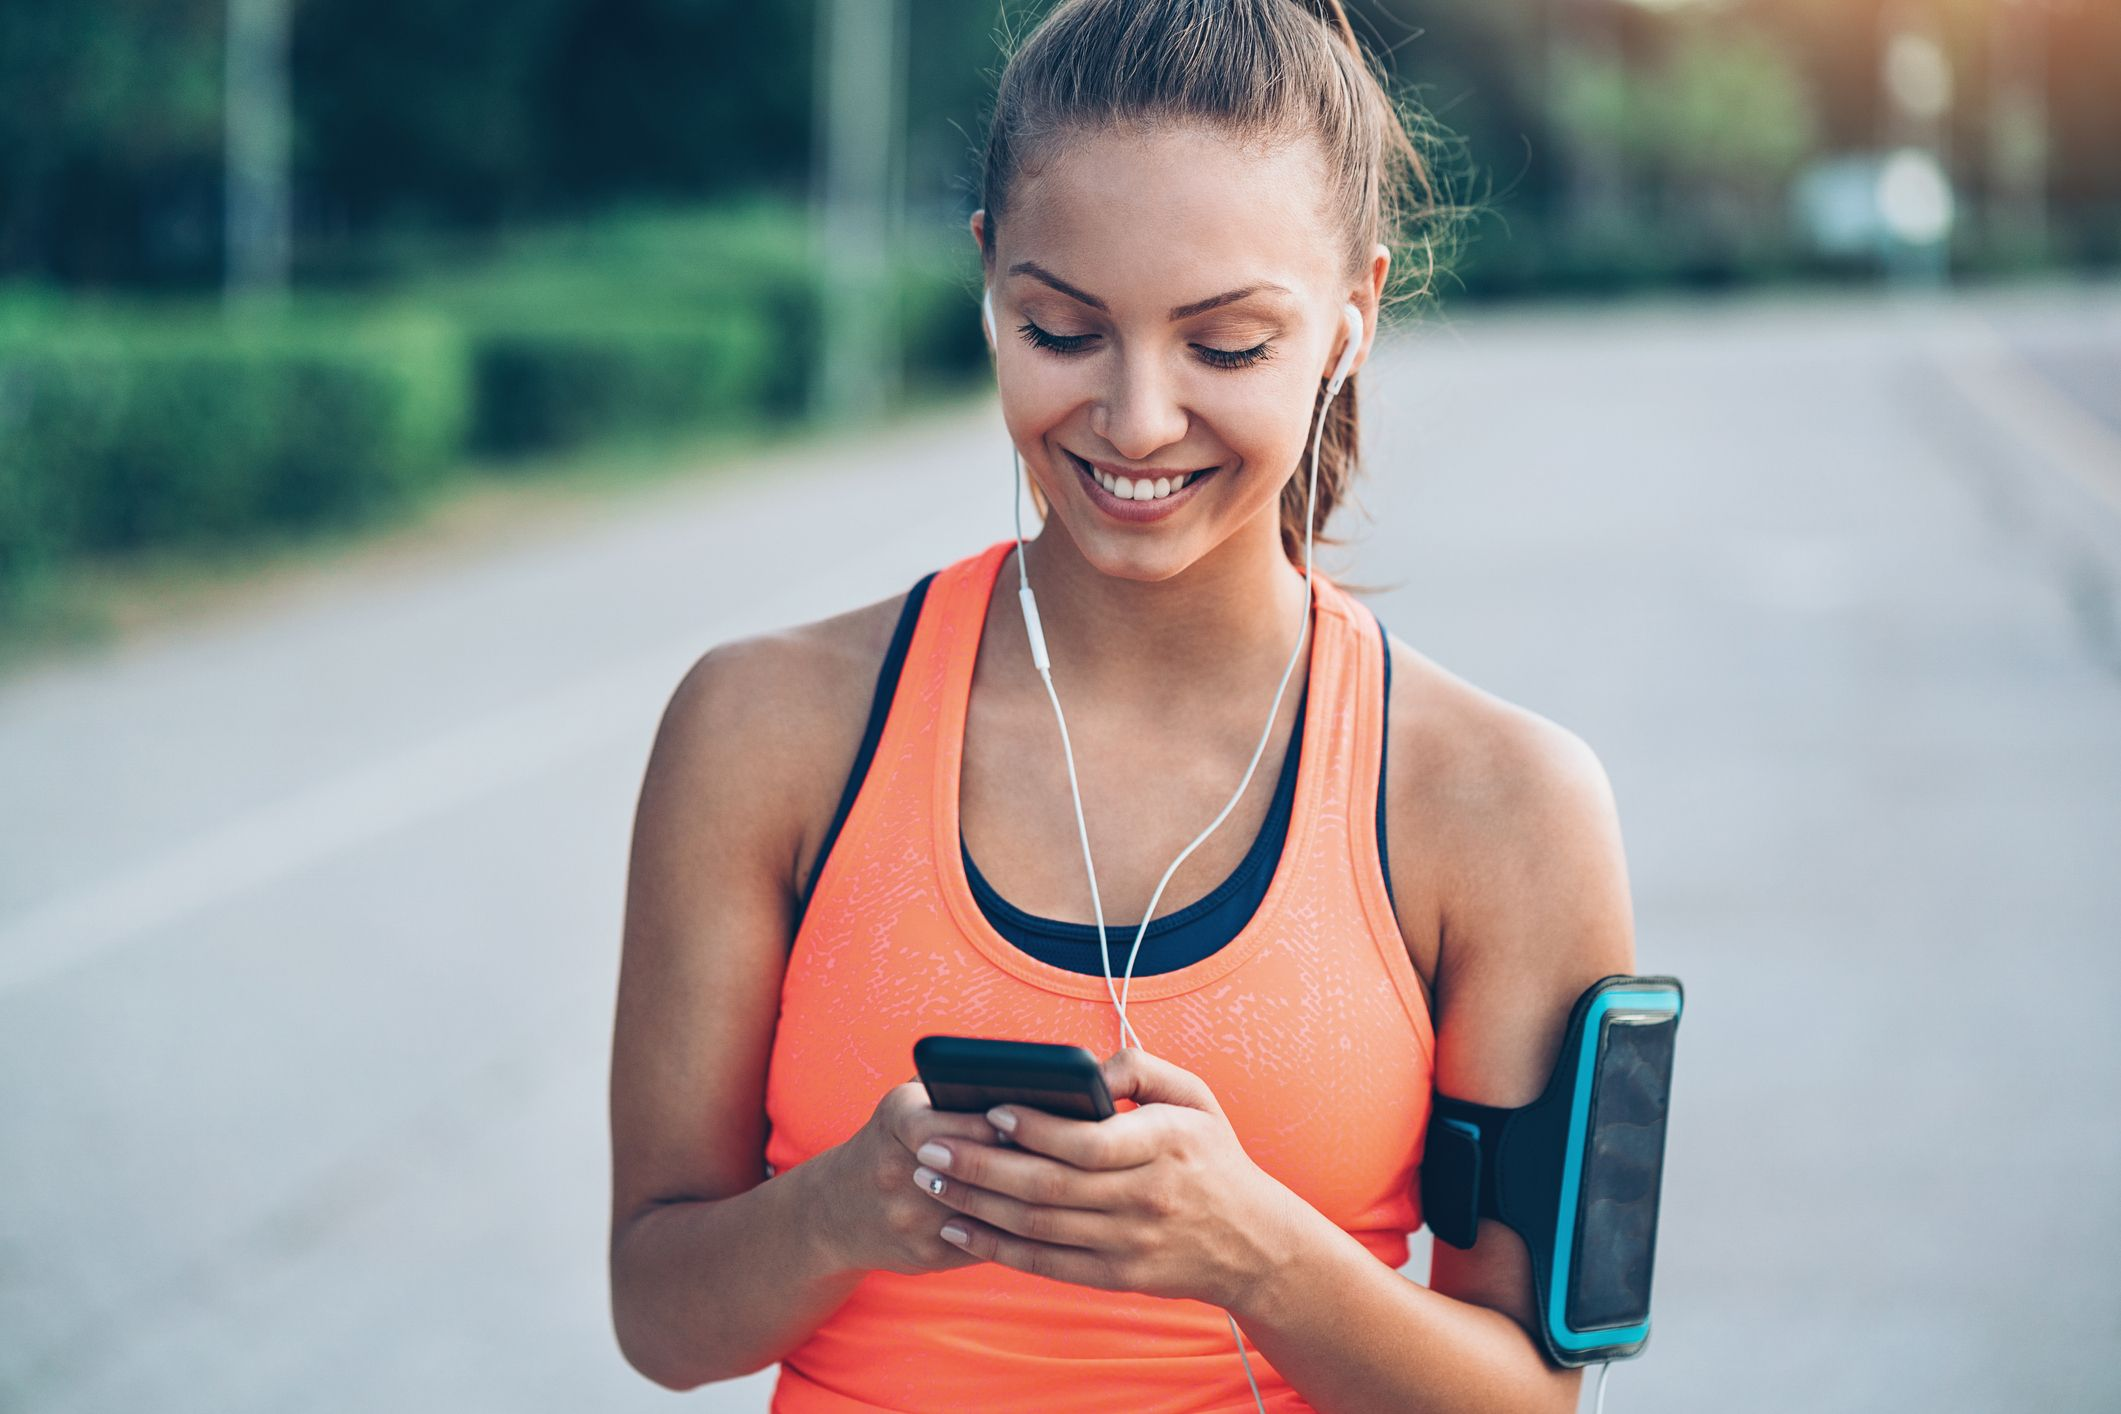 6 best exercises for mental health